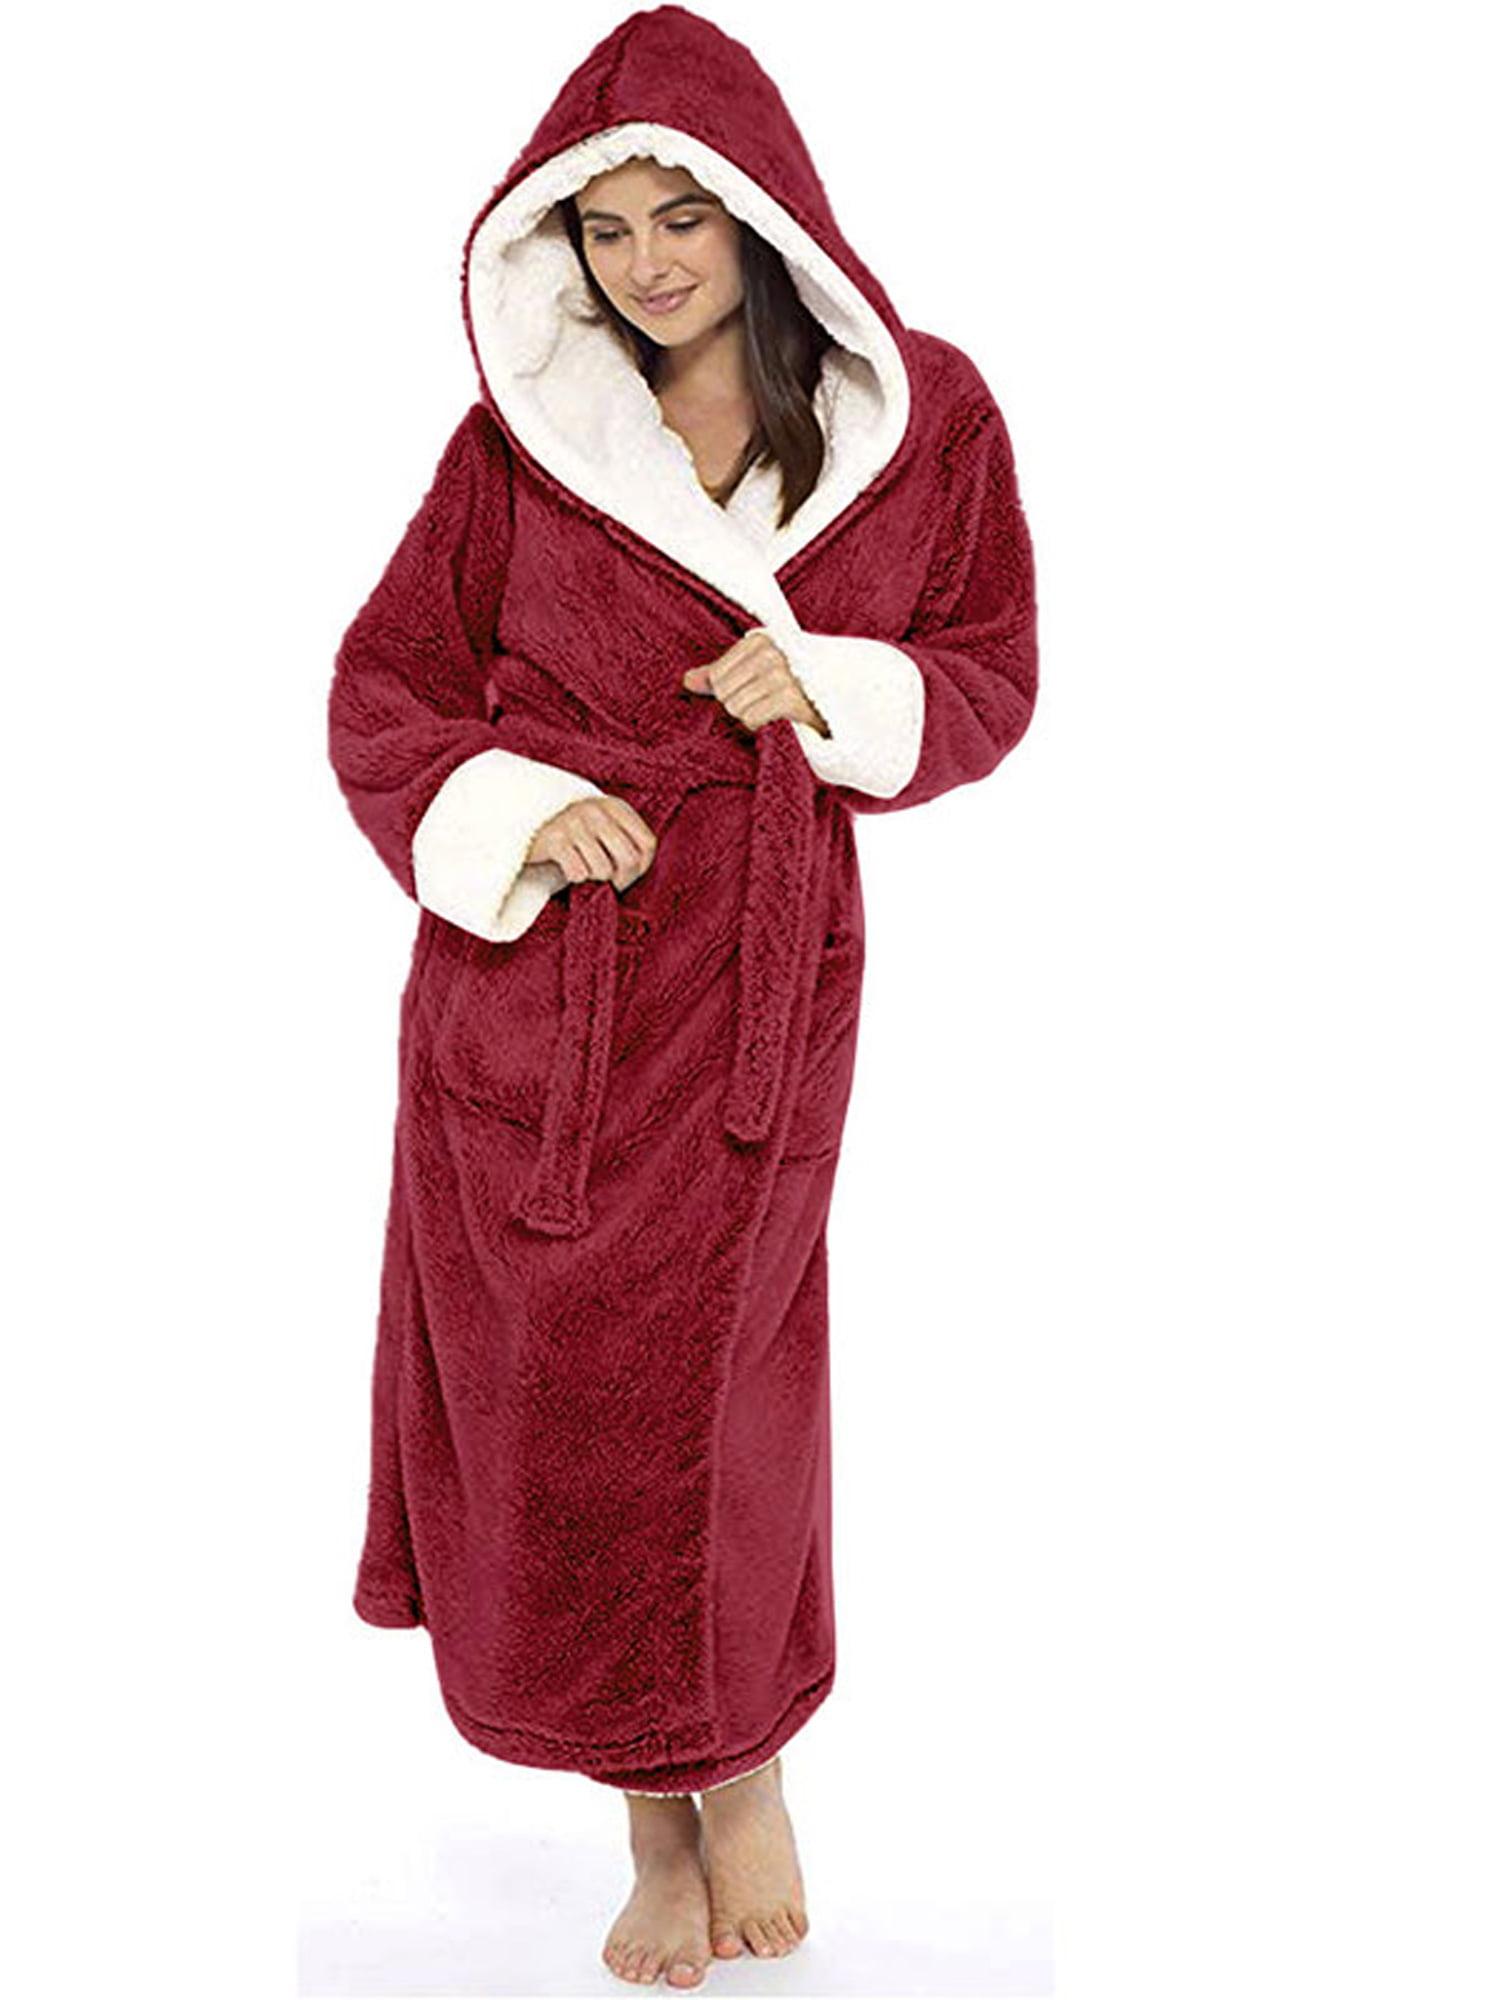 Men/'s Flannel Fleece Fluffy Plush Hooded Dressing Gown Winter Robe Sizes 3XL-5XL